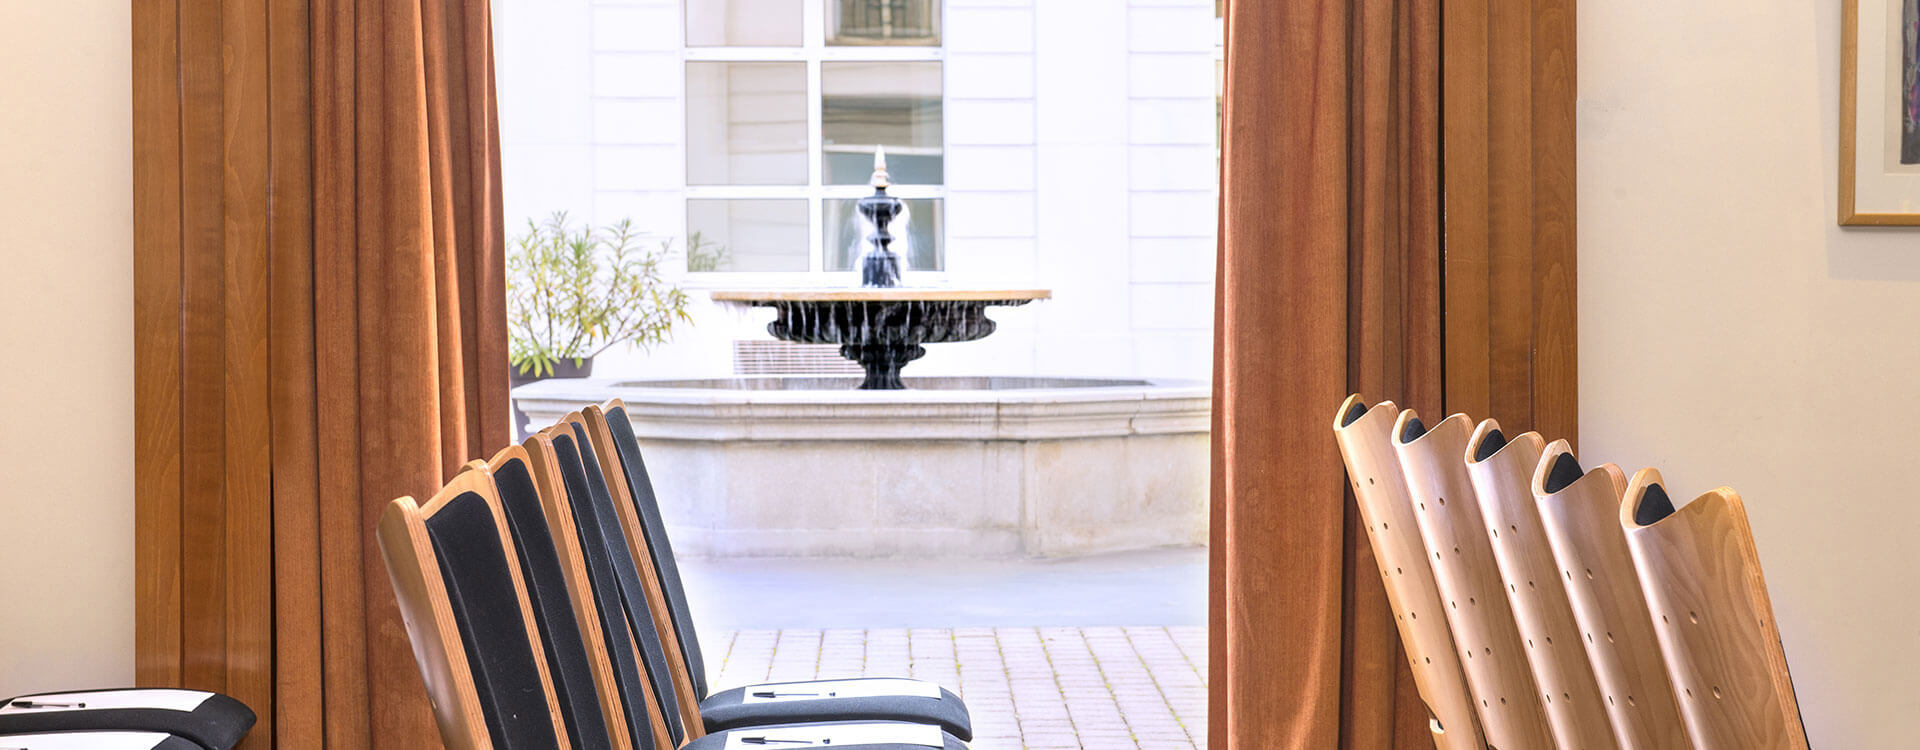 Séminaires - Hôtel*** Paris La Villa Modigliani